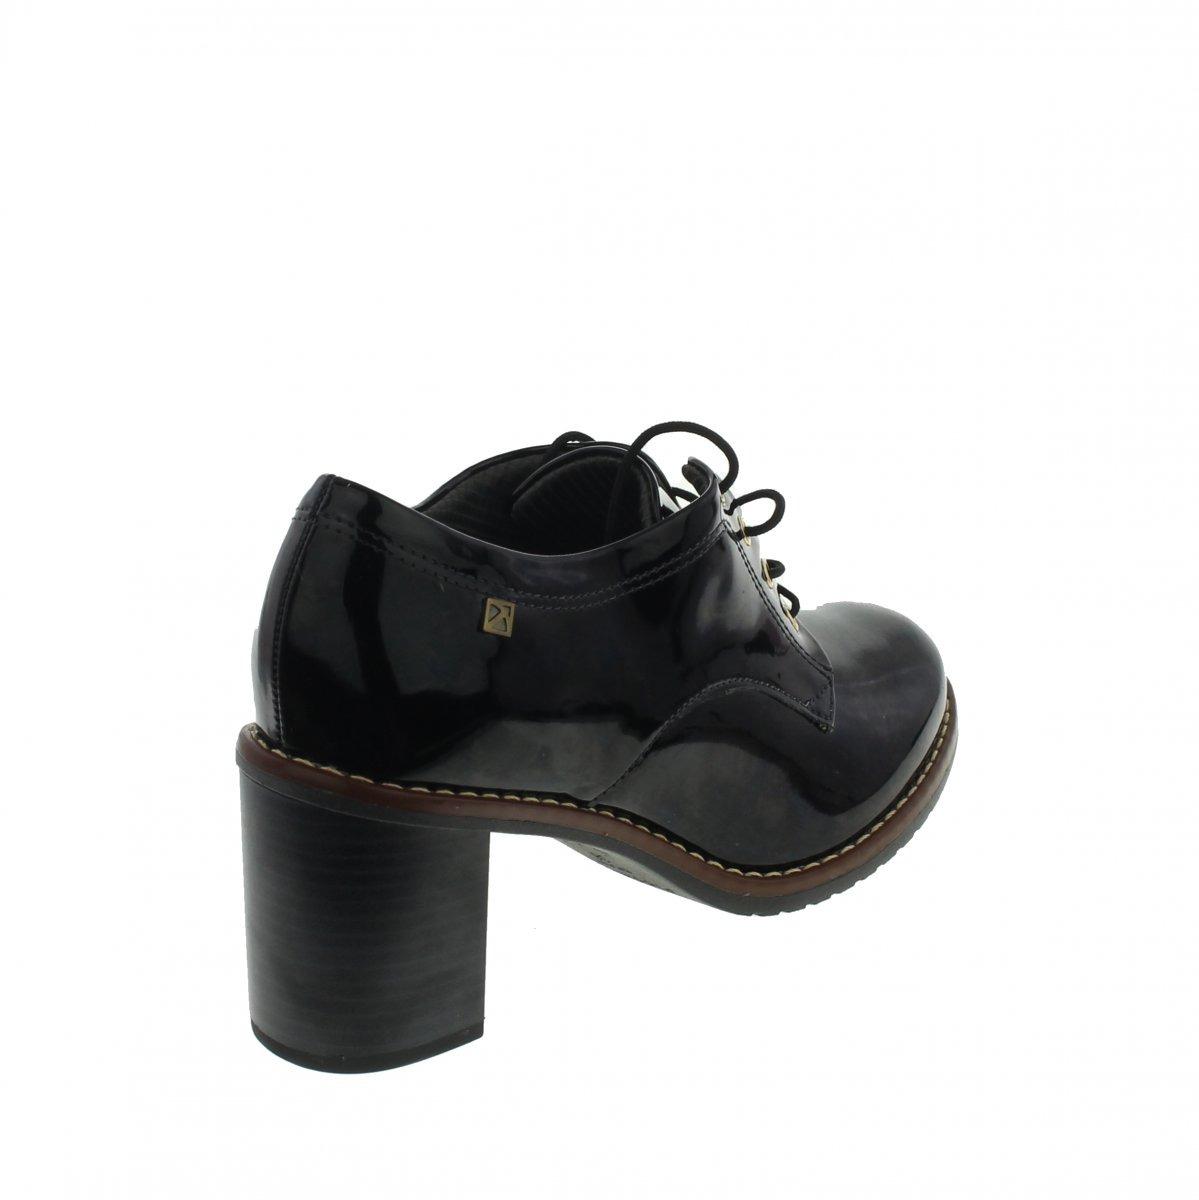 0cd27a0ef Carregando zoom... sapato social piccadilly 342007 feminino preto verniz ...